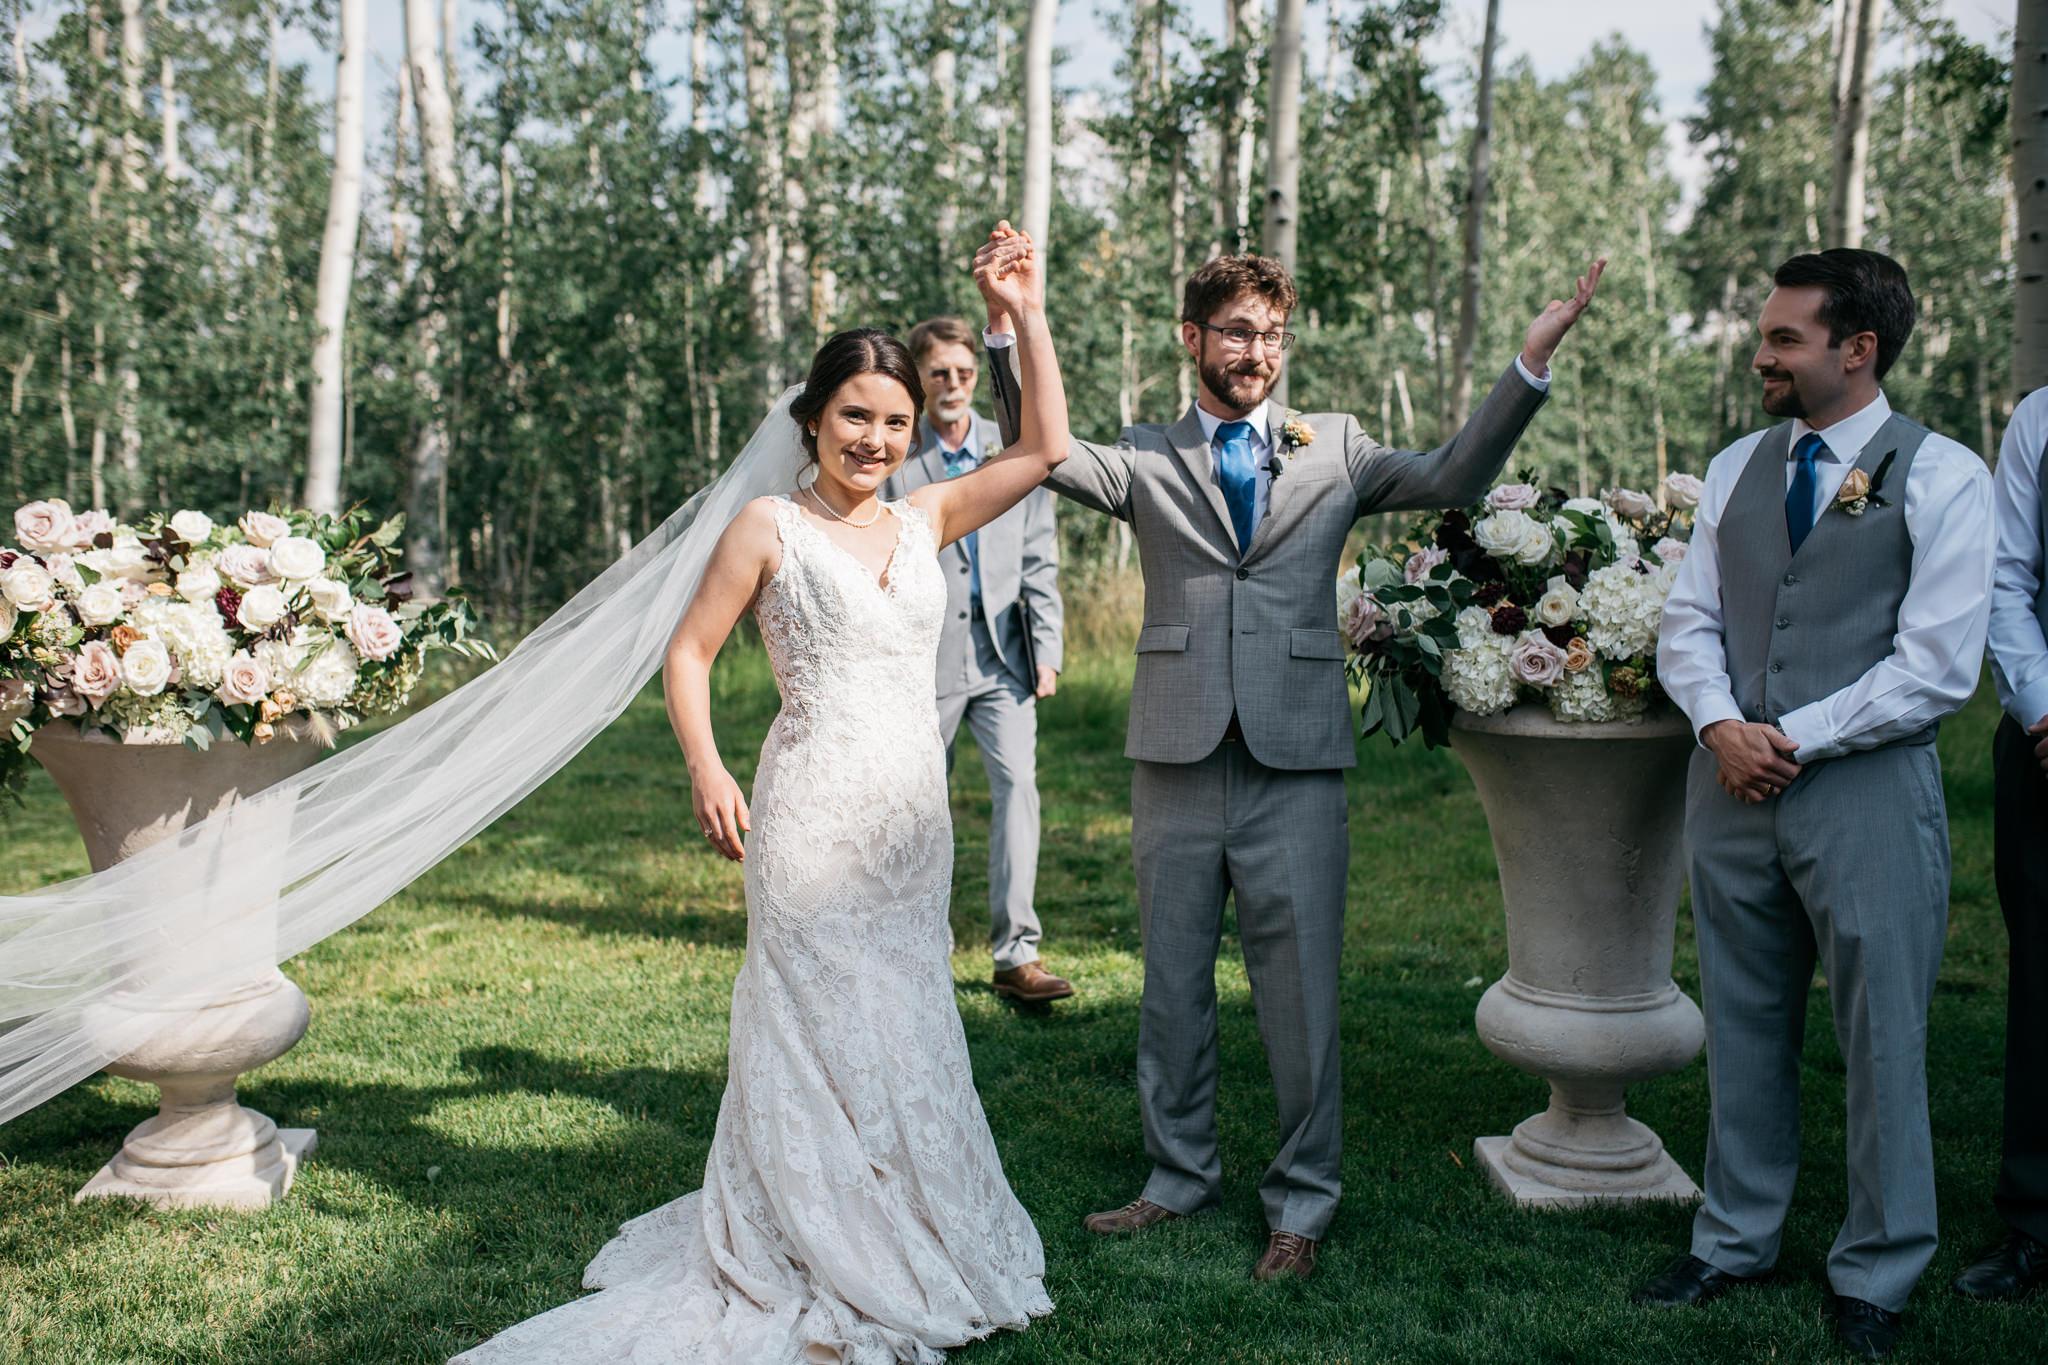 290_ONL_Kat_Nick_Wedding_Trevor_Hooper_Photo.jpg